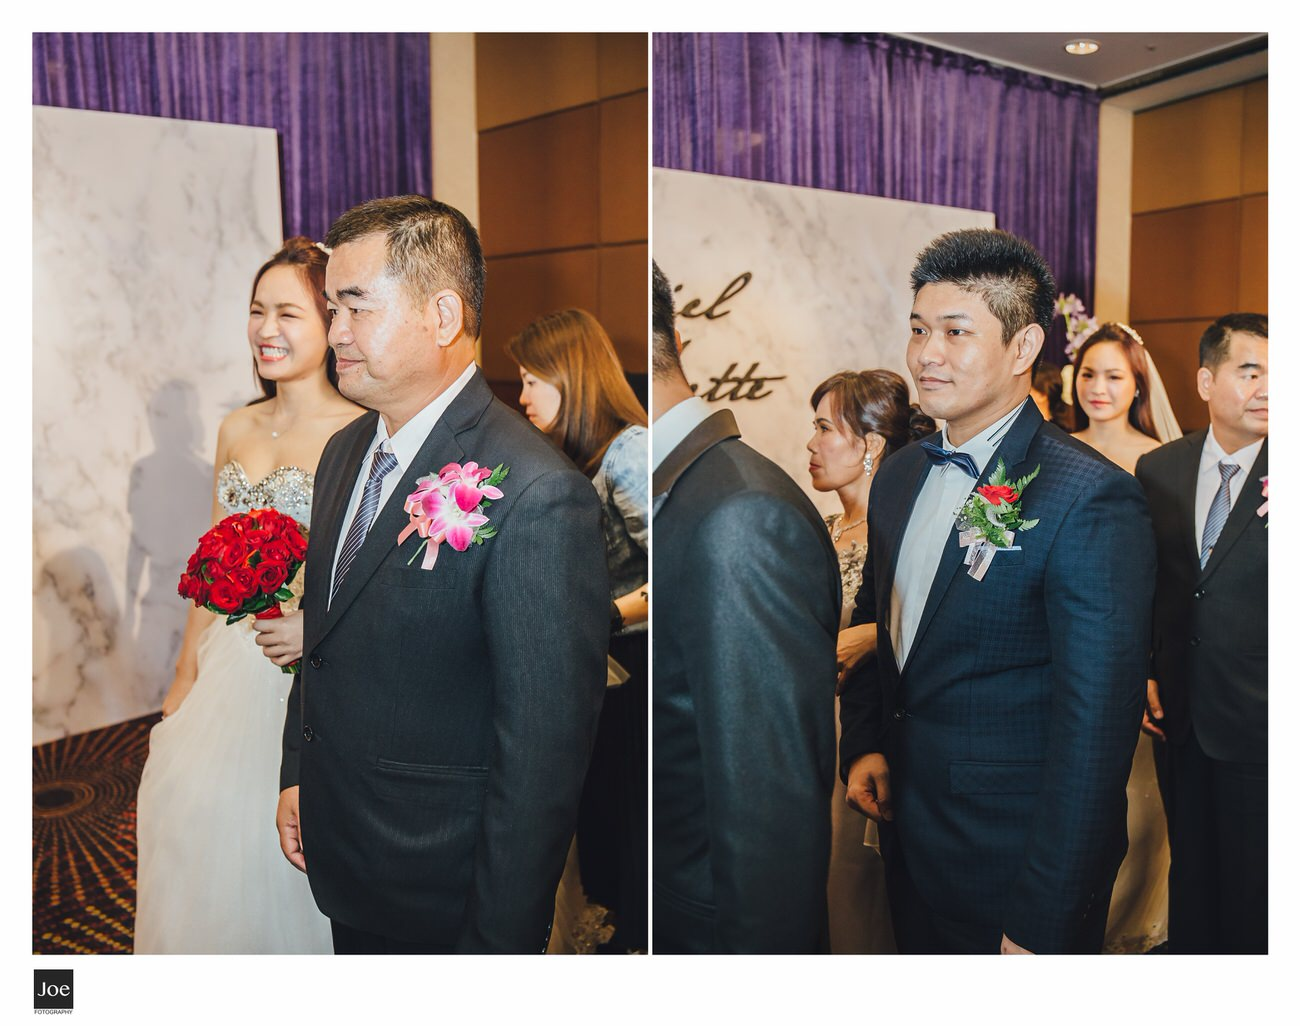 grand-hilai-hotel-wedding-daniel-yvette-joe-fotography-110.jpg